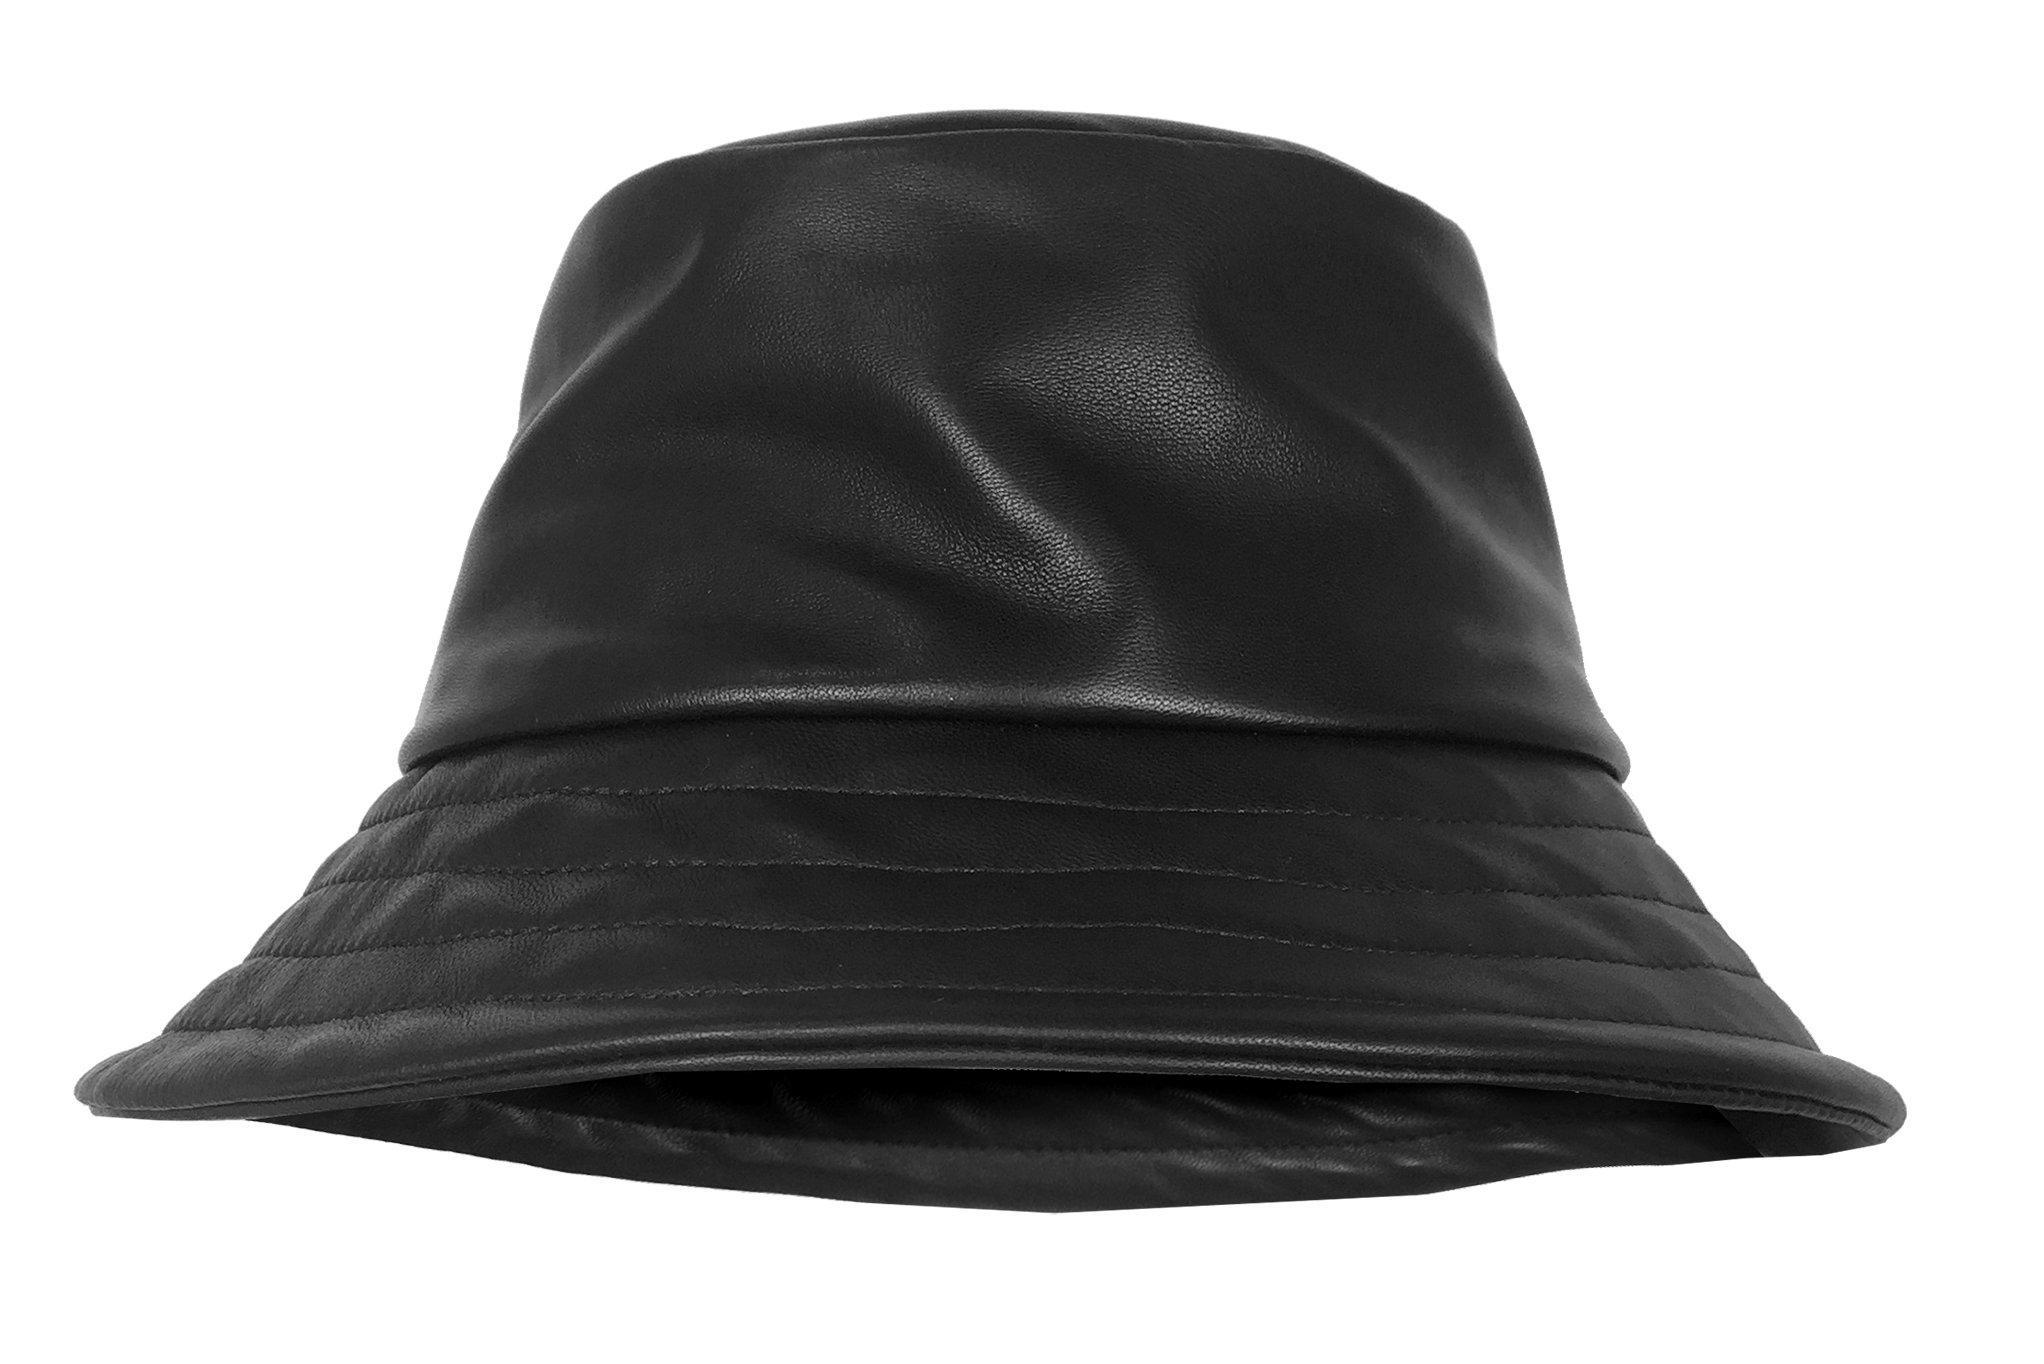 52c4564f4c9eca ... Ginger Leather Bucket Hat - Lyst. View fullscreen